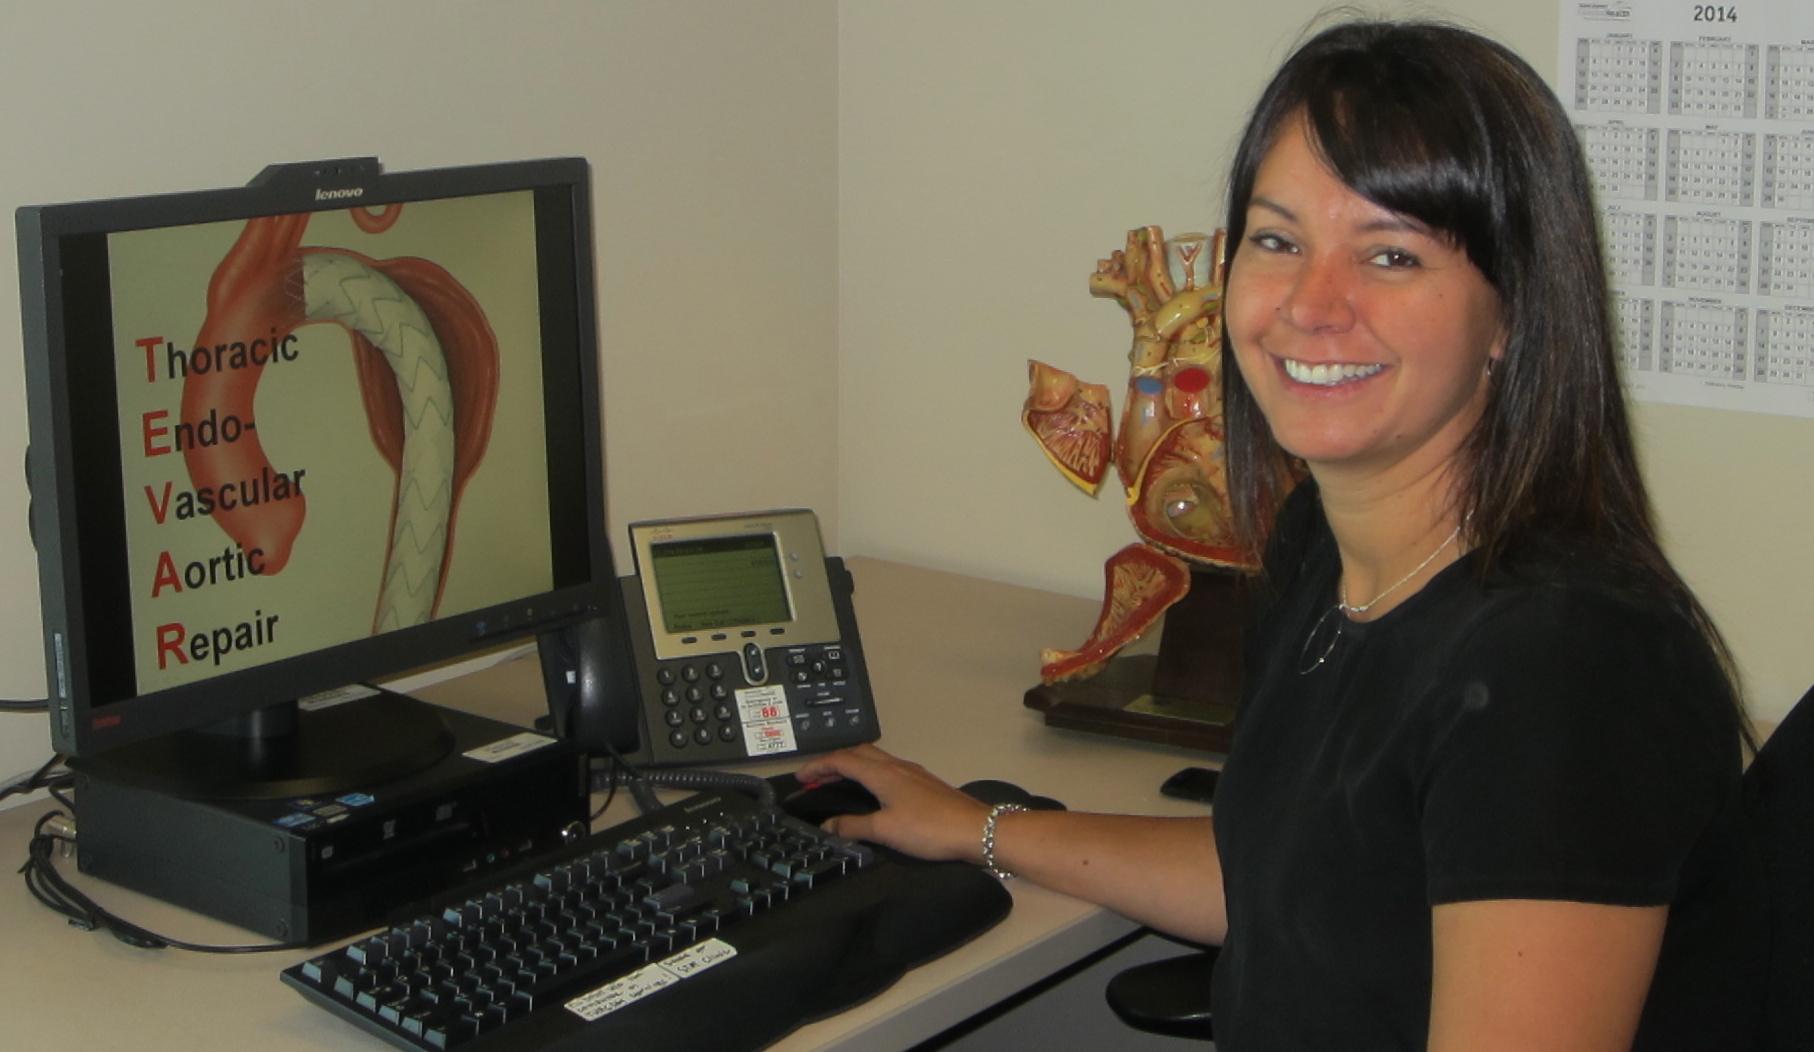 TD Aboriginal Nursing Award (PhD Level)